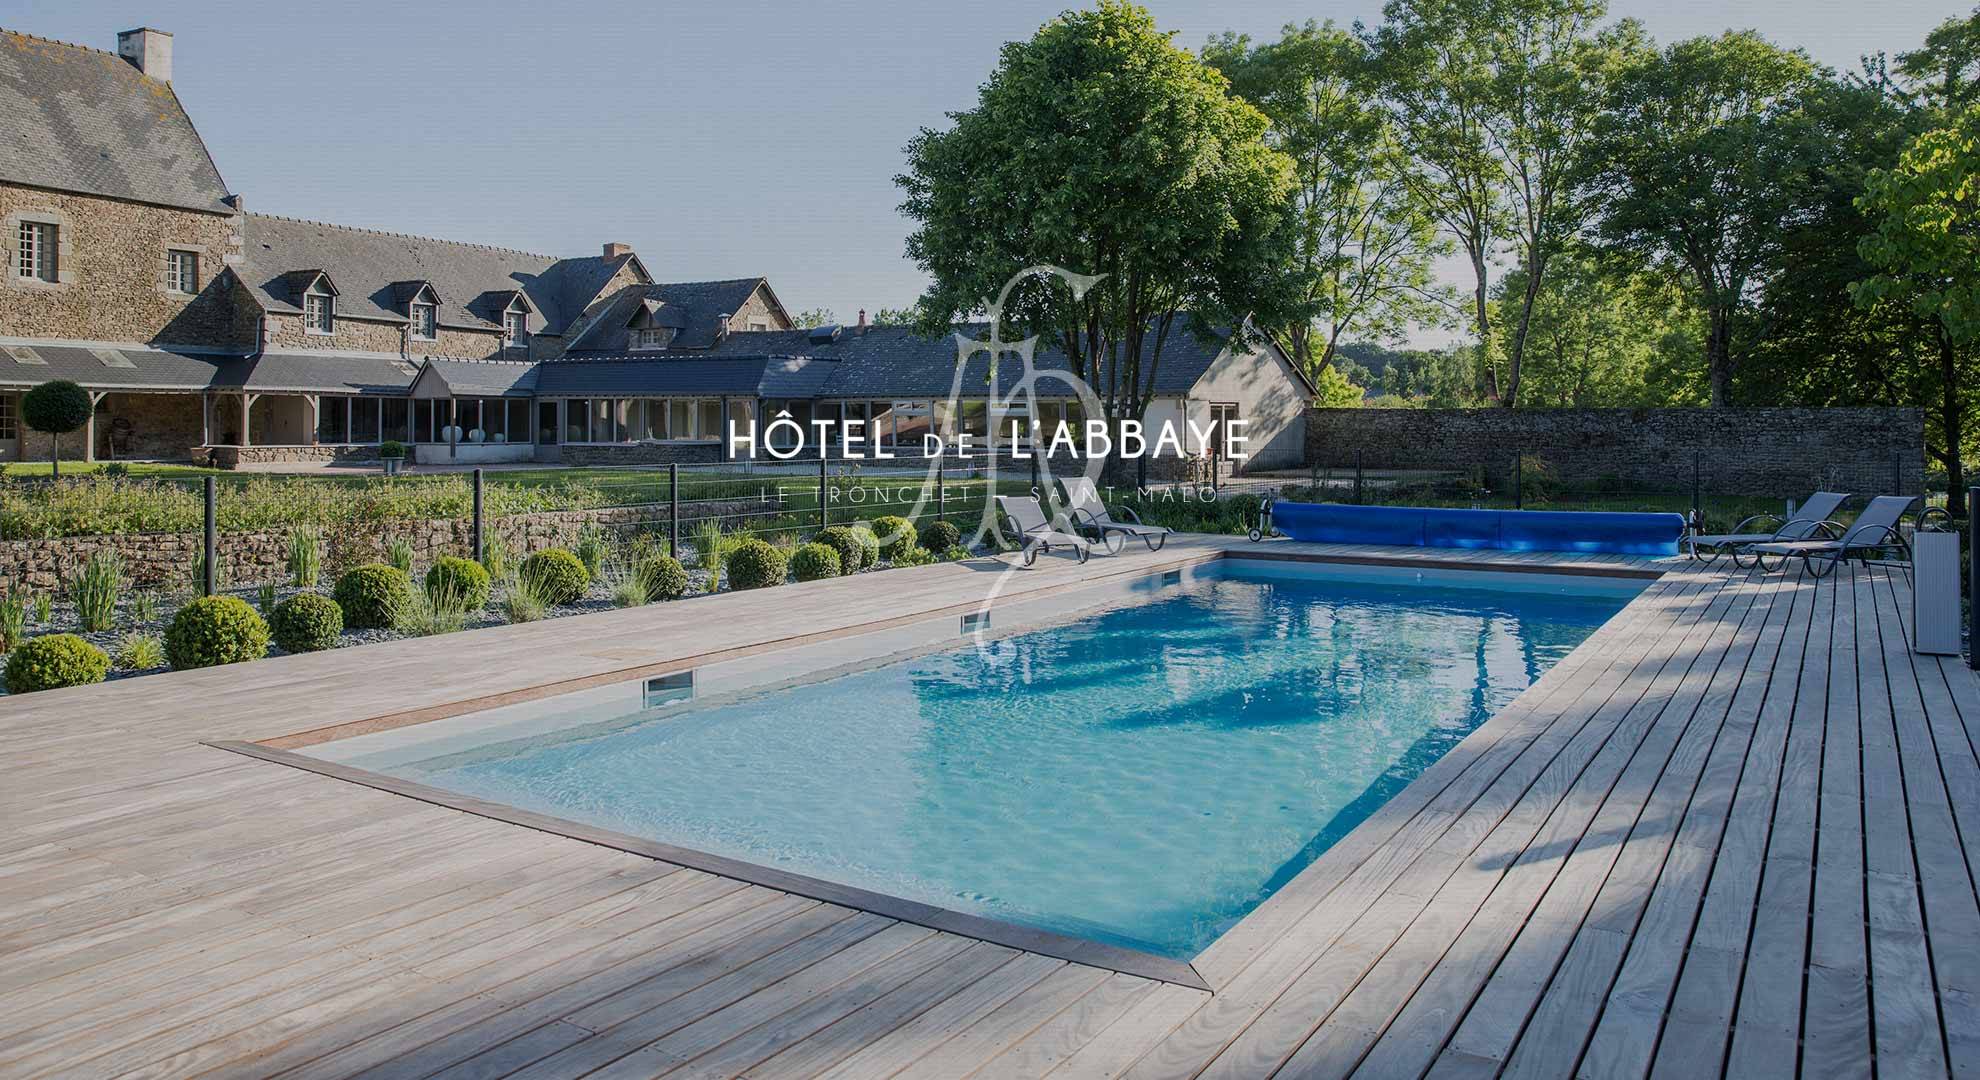 HOTEL DE CHARME avec piscine